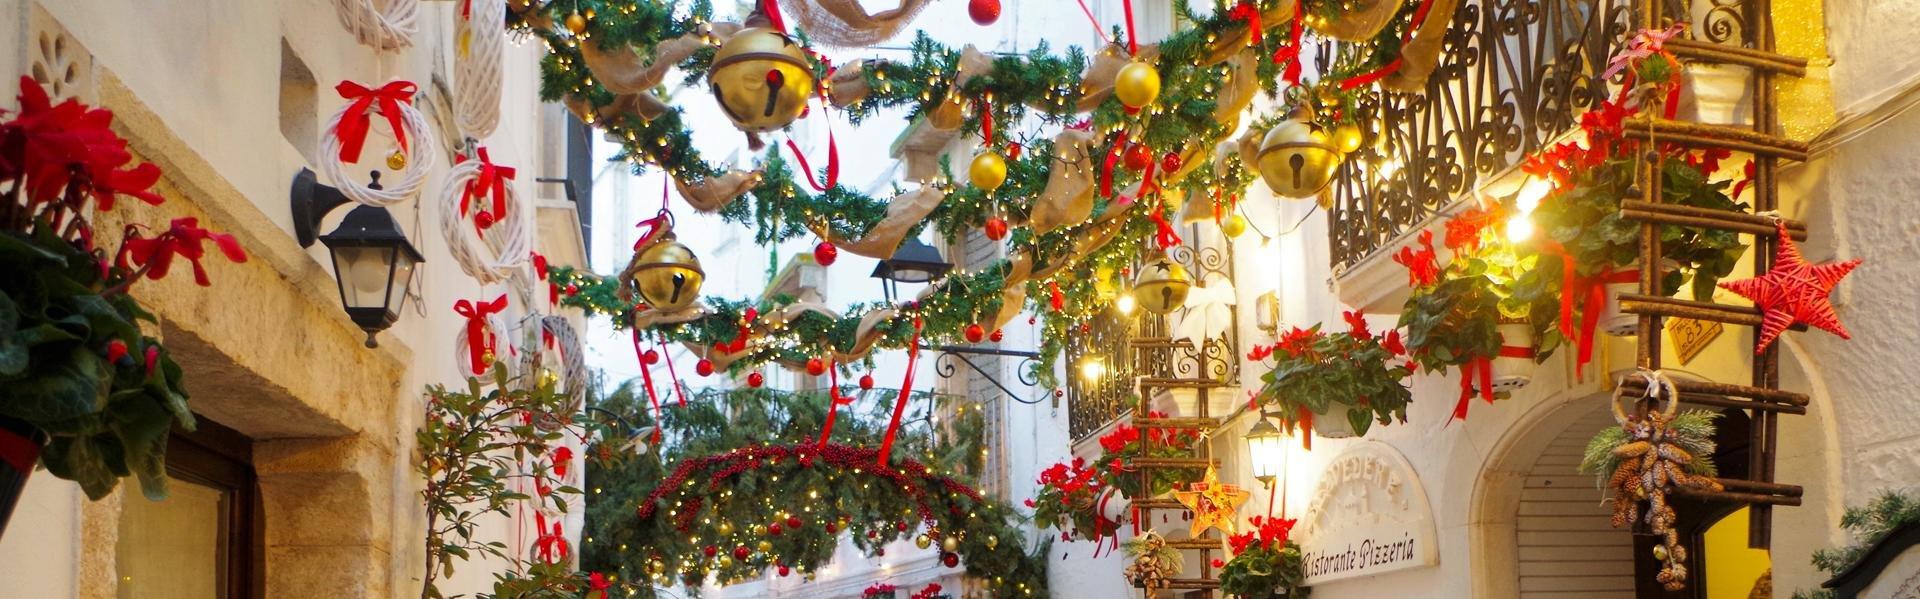 Kerst in Locorotondo, Italië